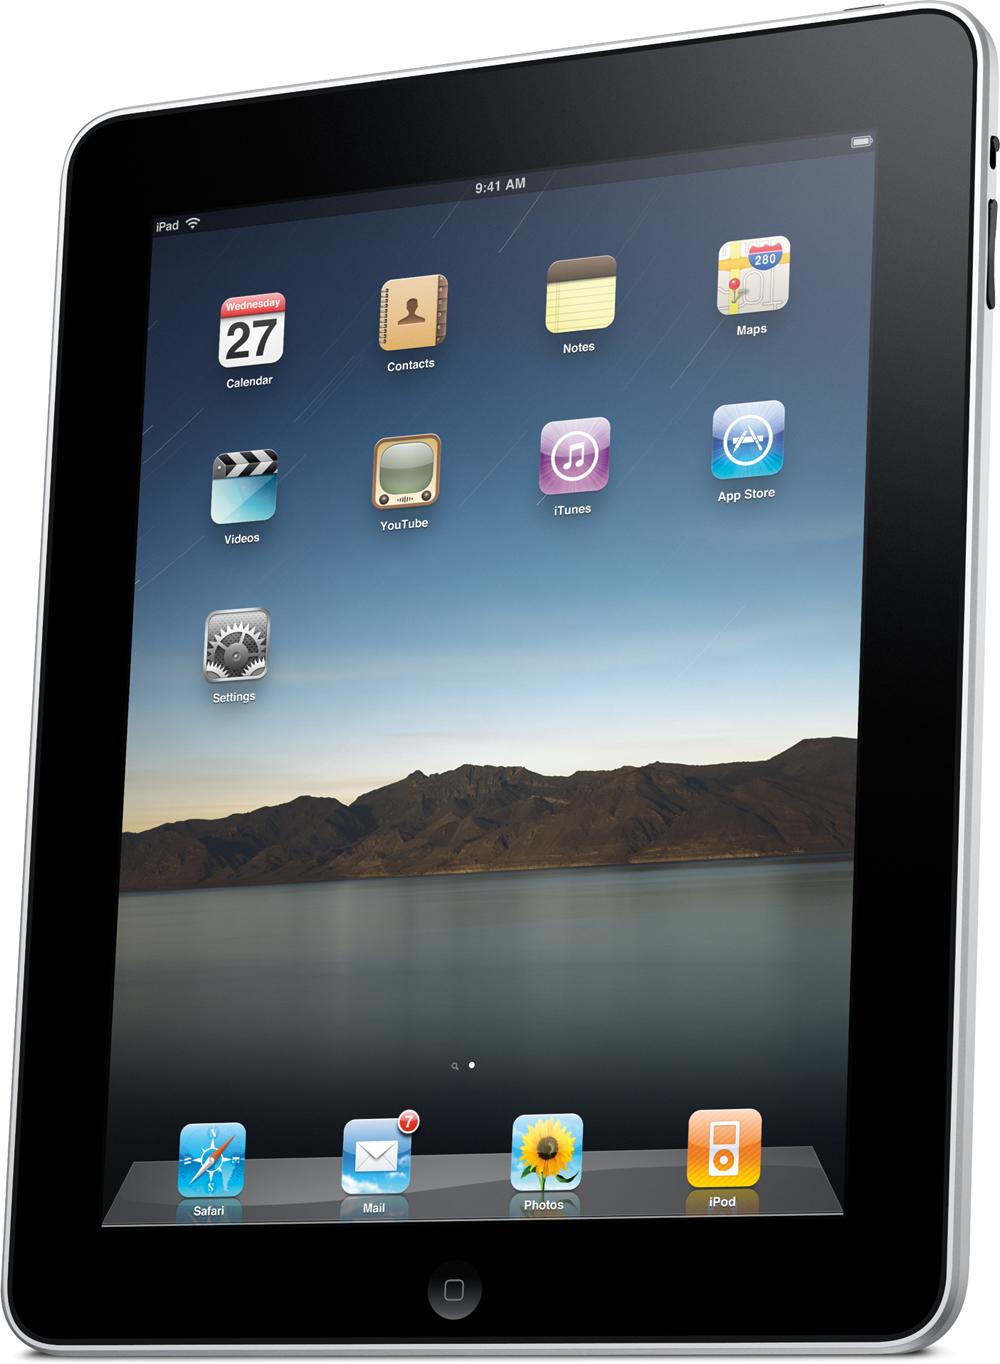 iPad frontal e grande